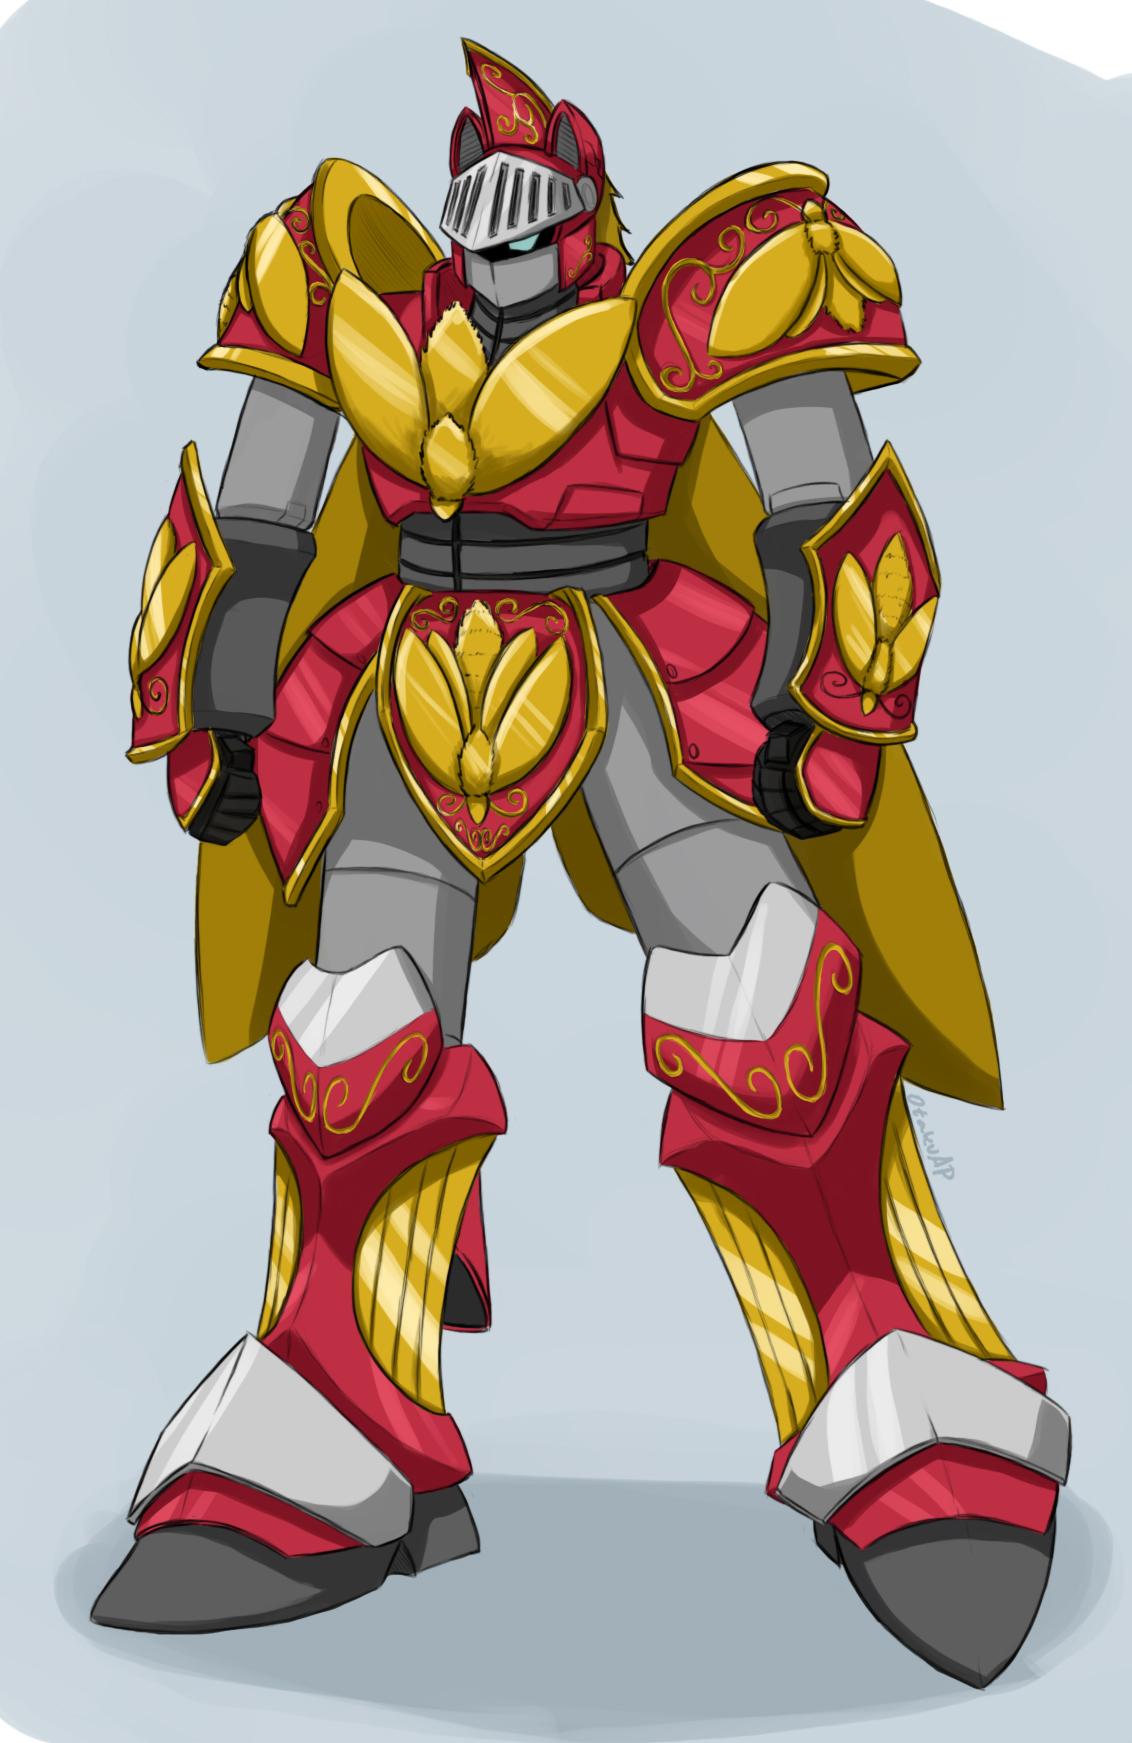 Ponymecha (humanoid mode) by otakuap